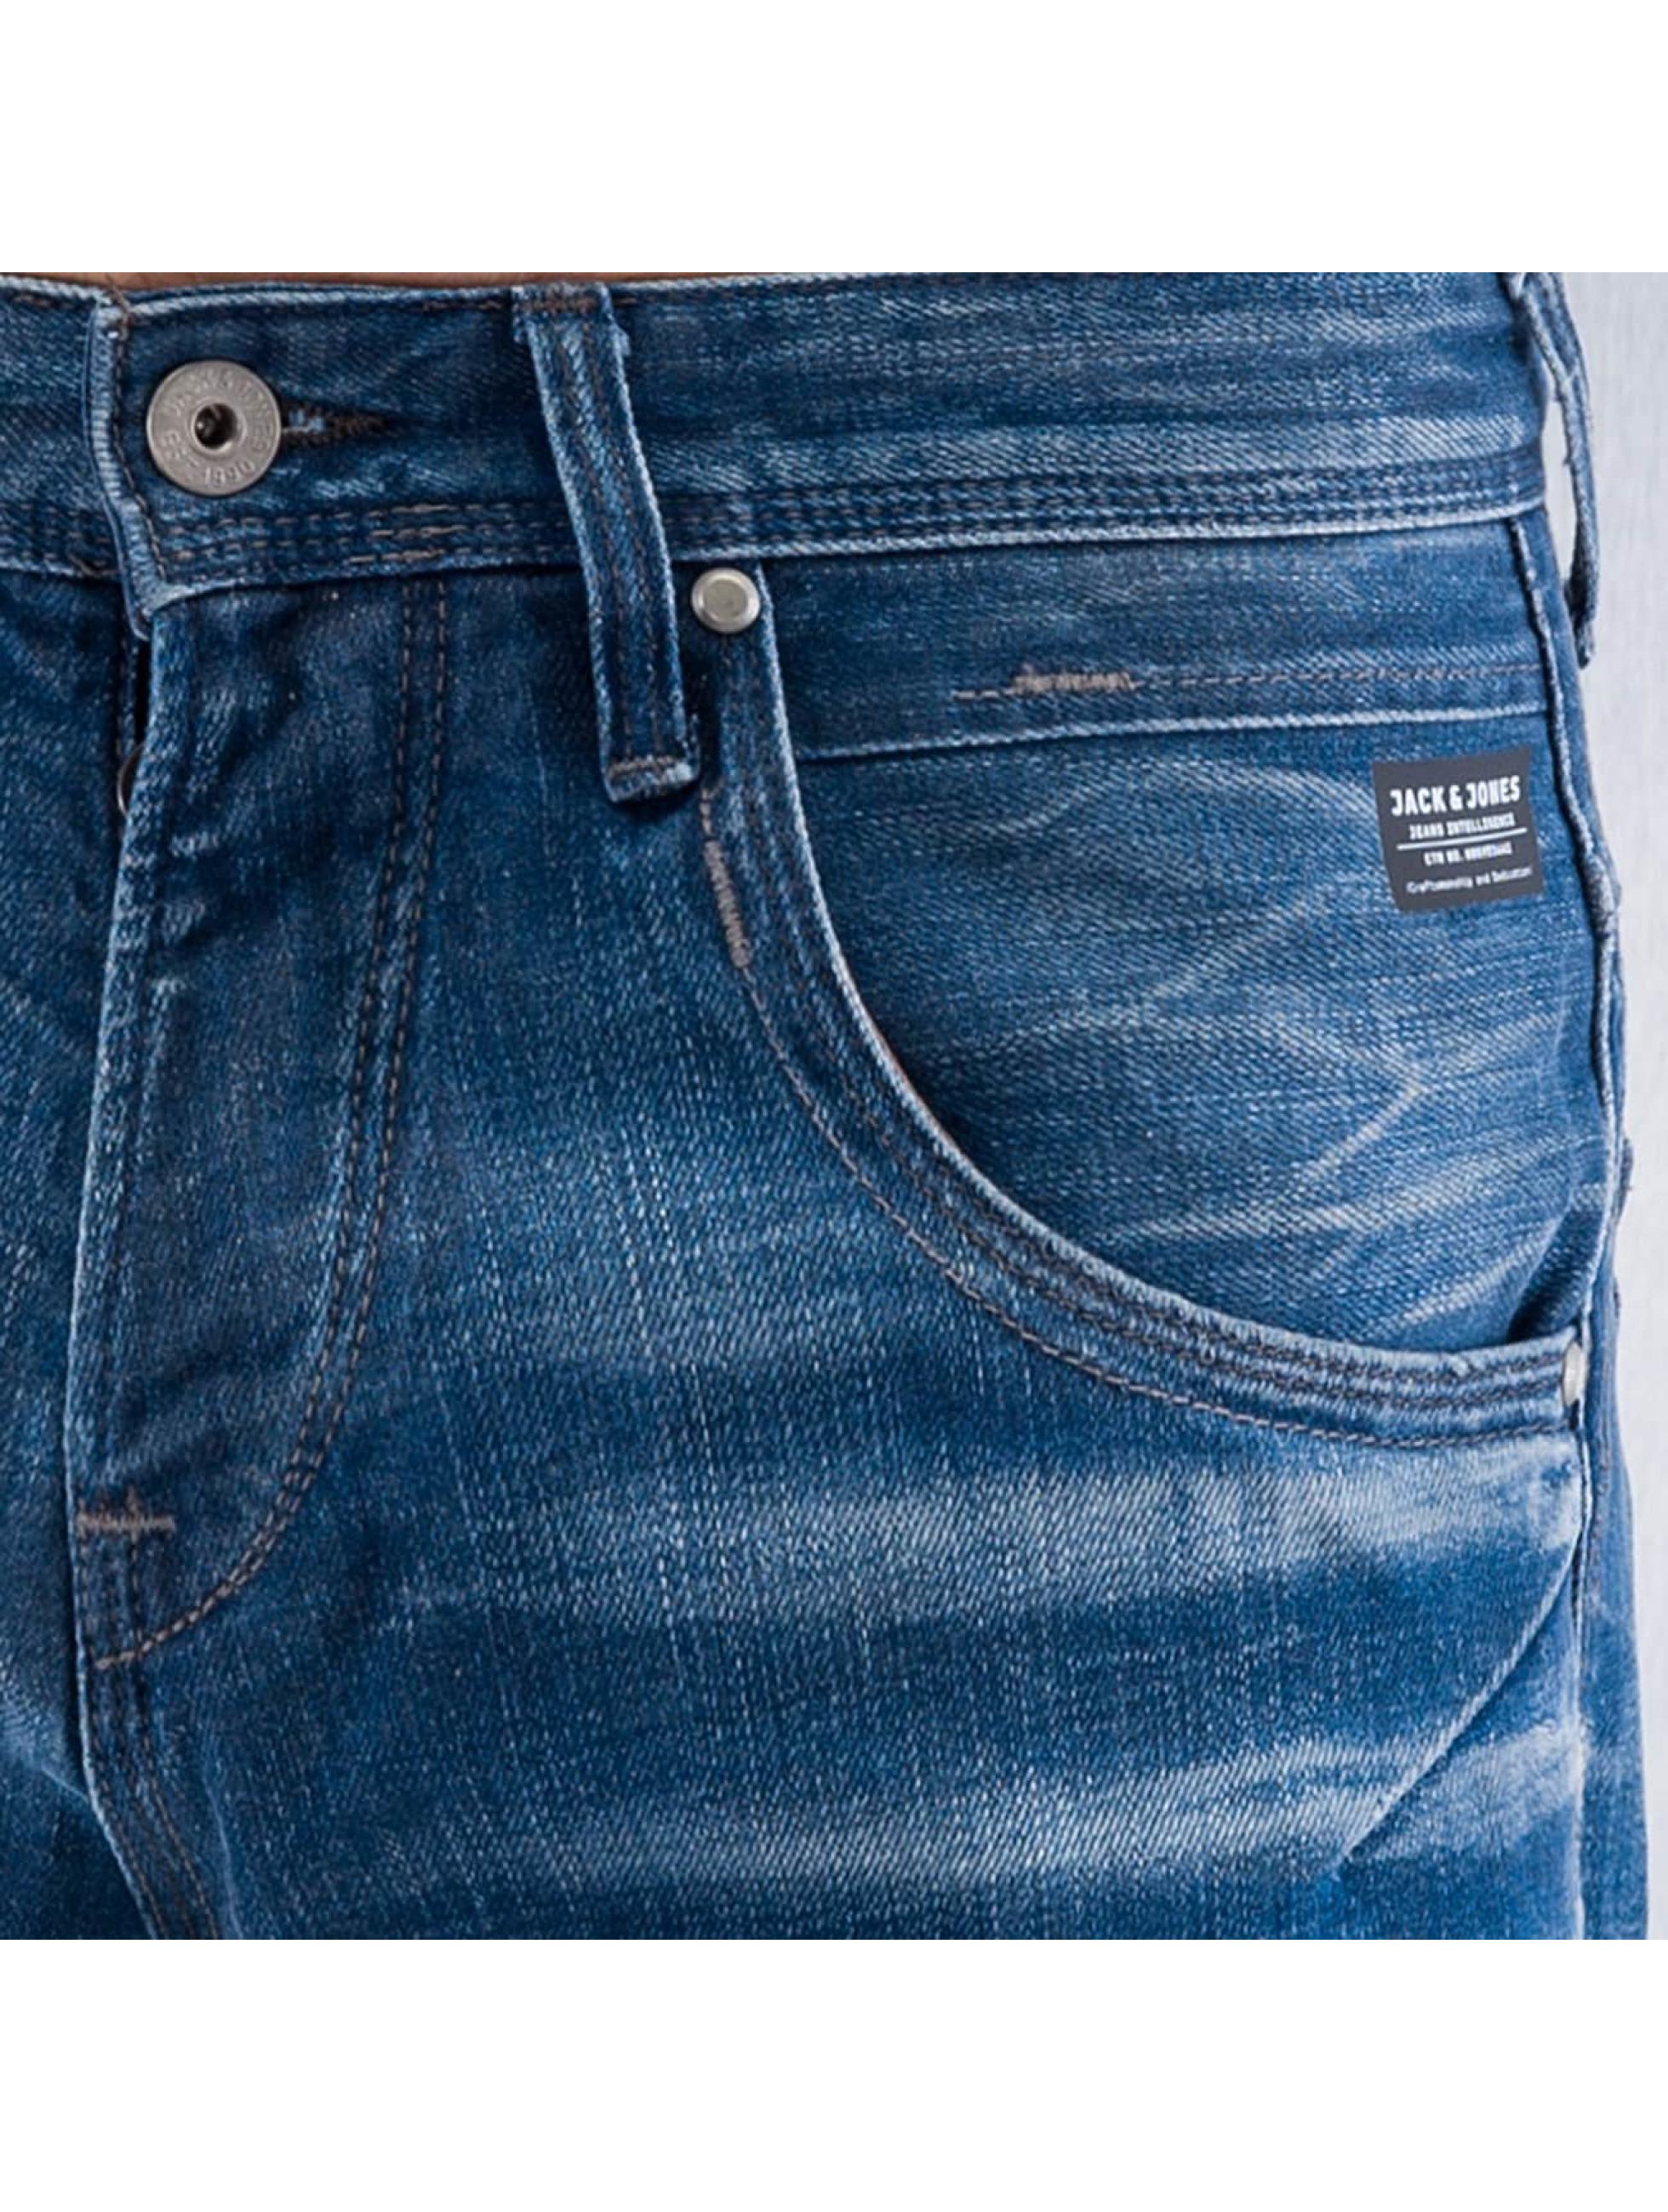 Jack & Jones Jean coupe droite jjBoxy jjLeed bleu